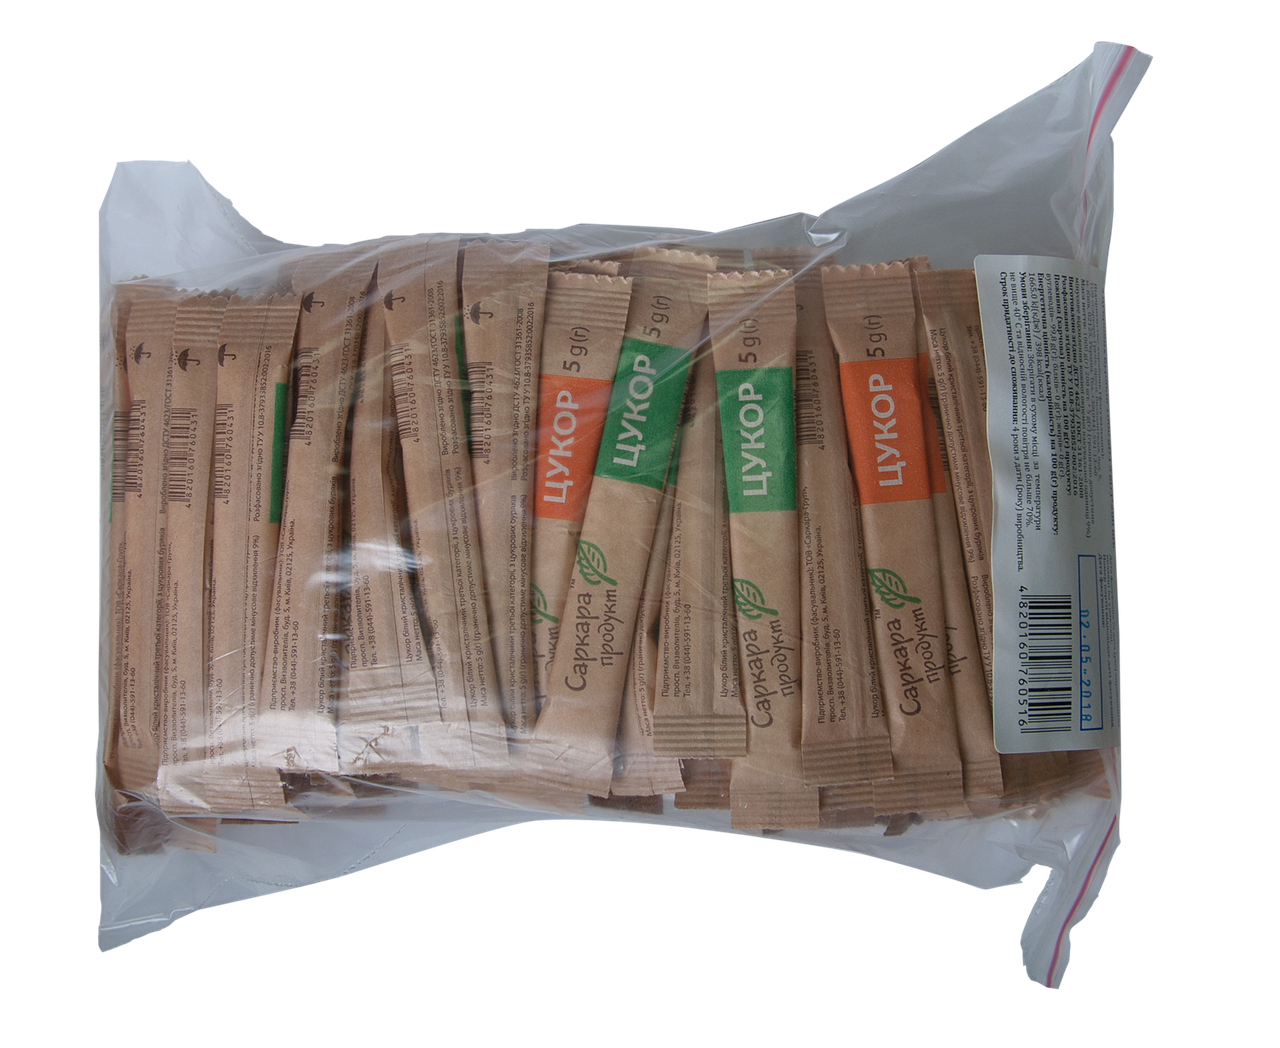 Сахар-песок в стиках ( 5г х 200 шт,) 1,0кг, zip-пакет